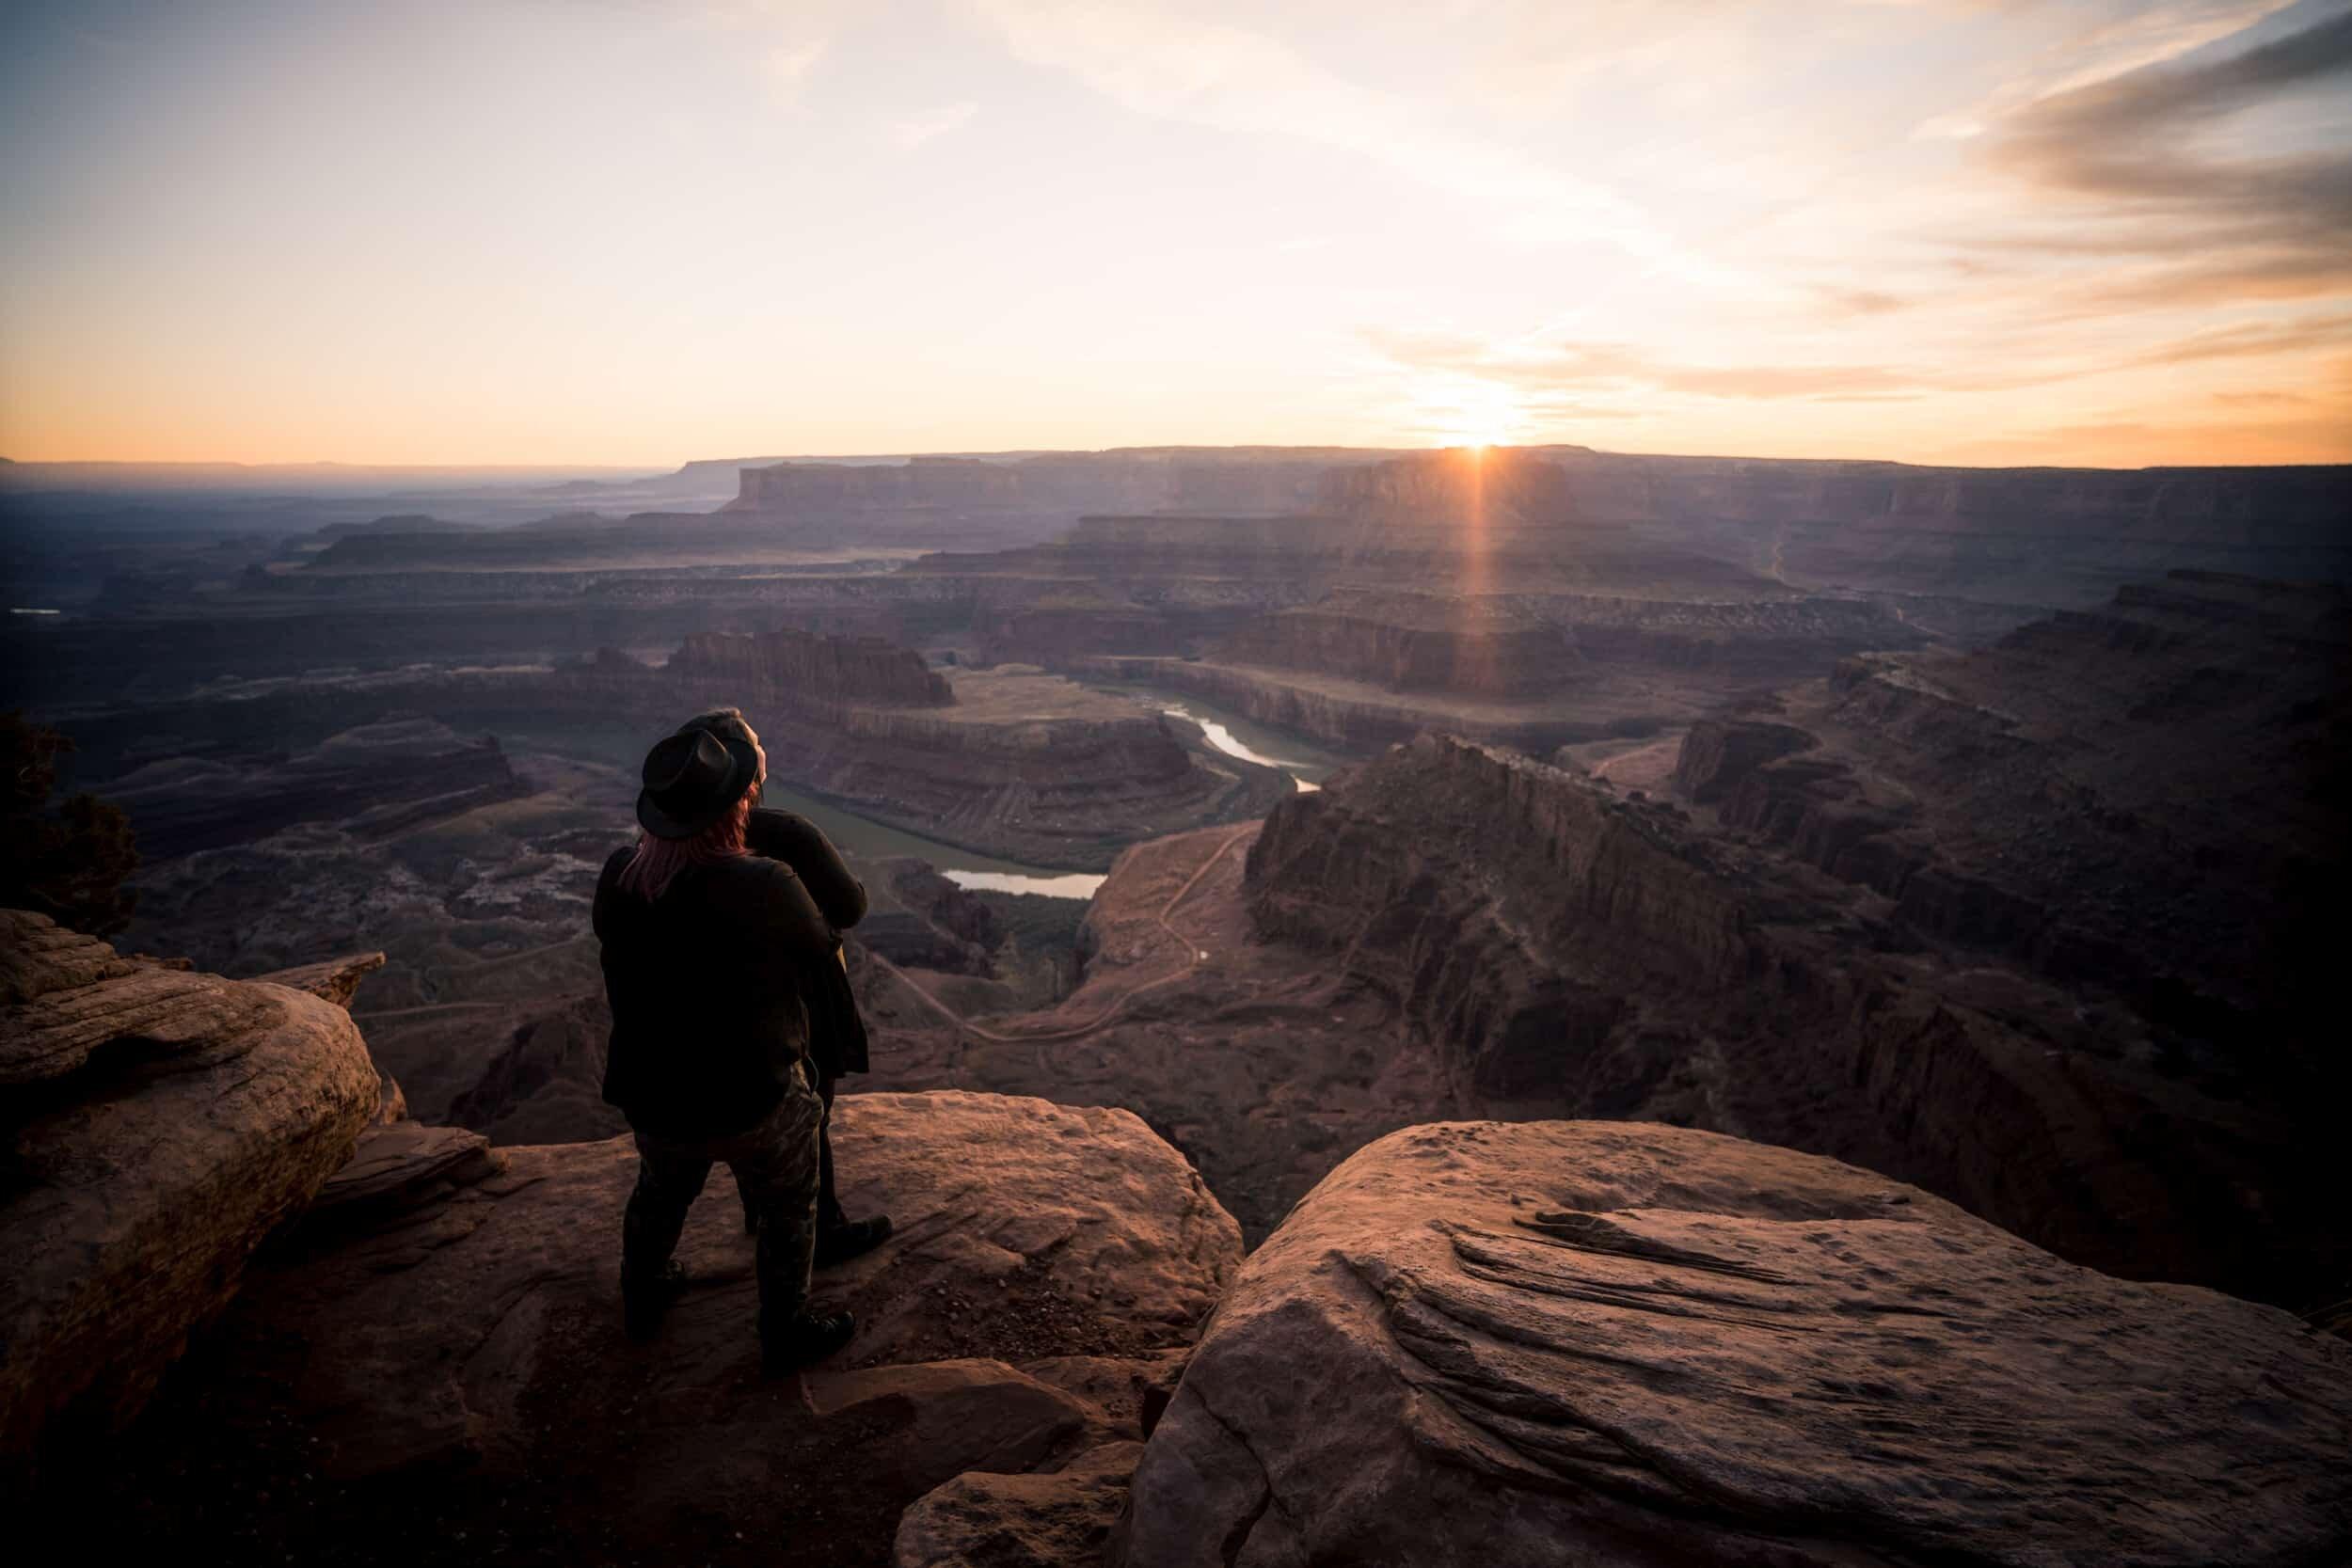 moab utah elopement photography. national park